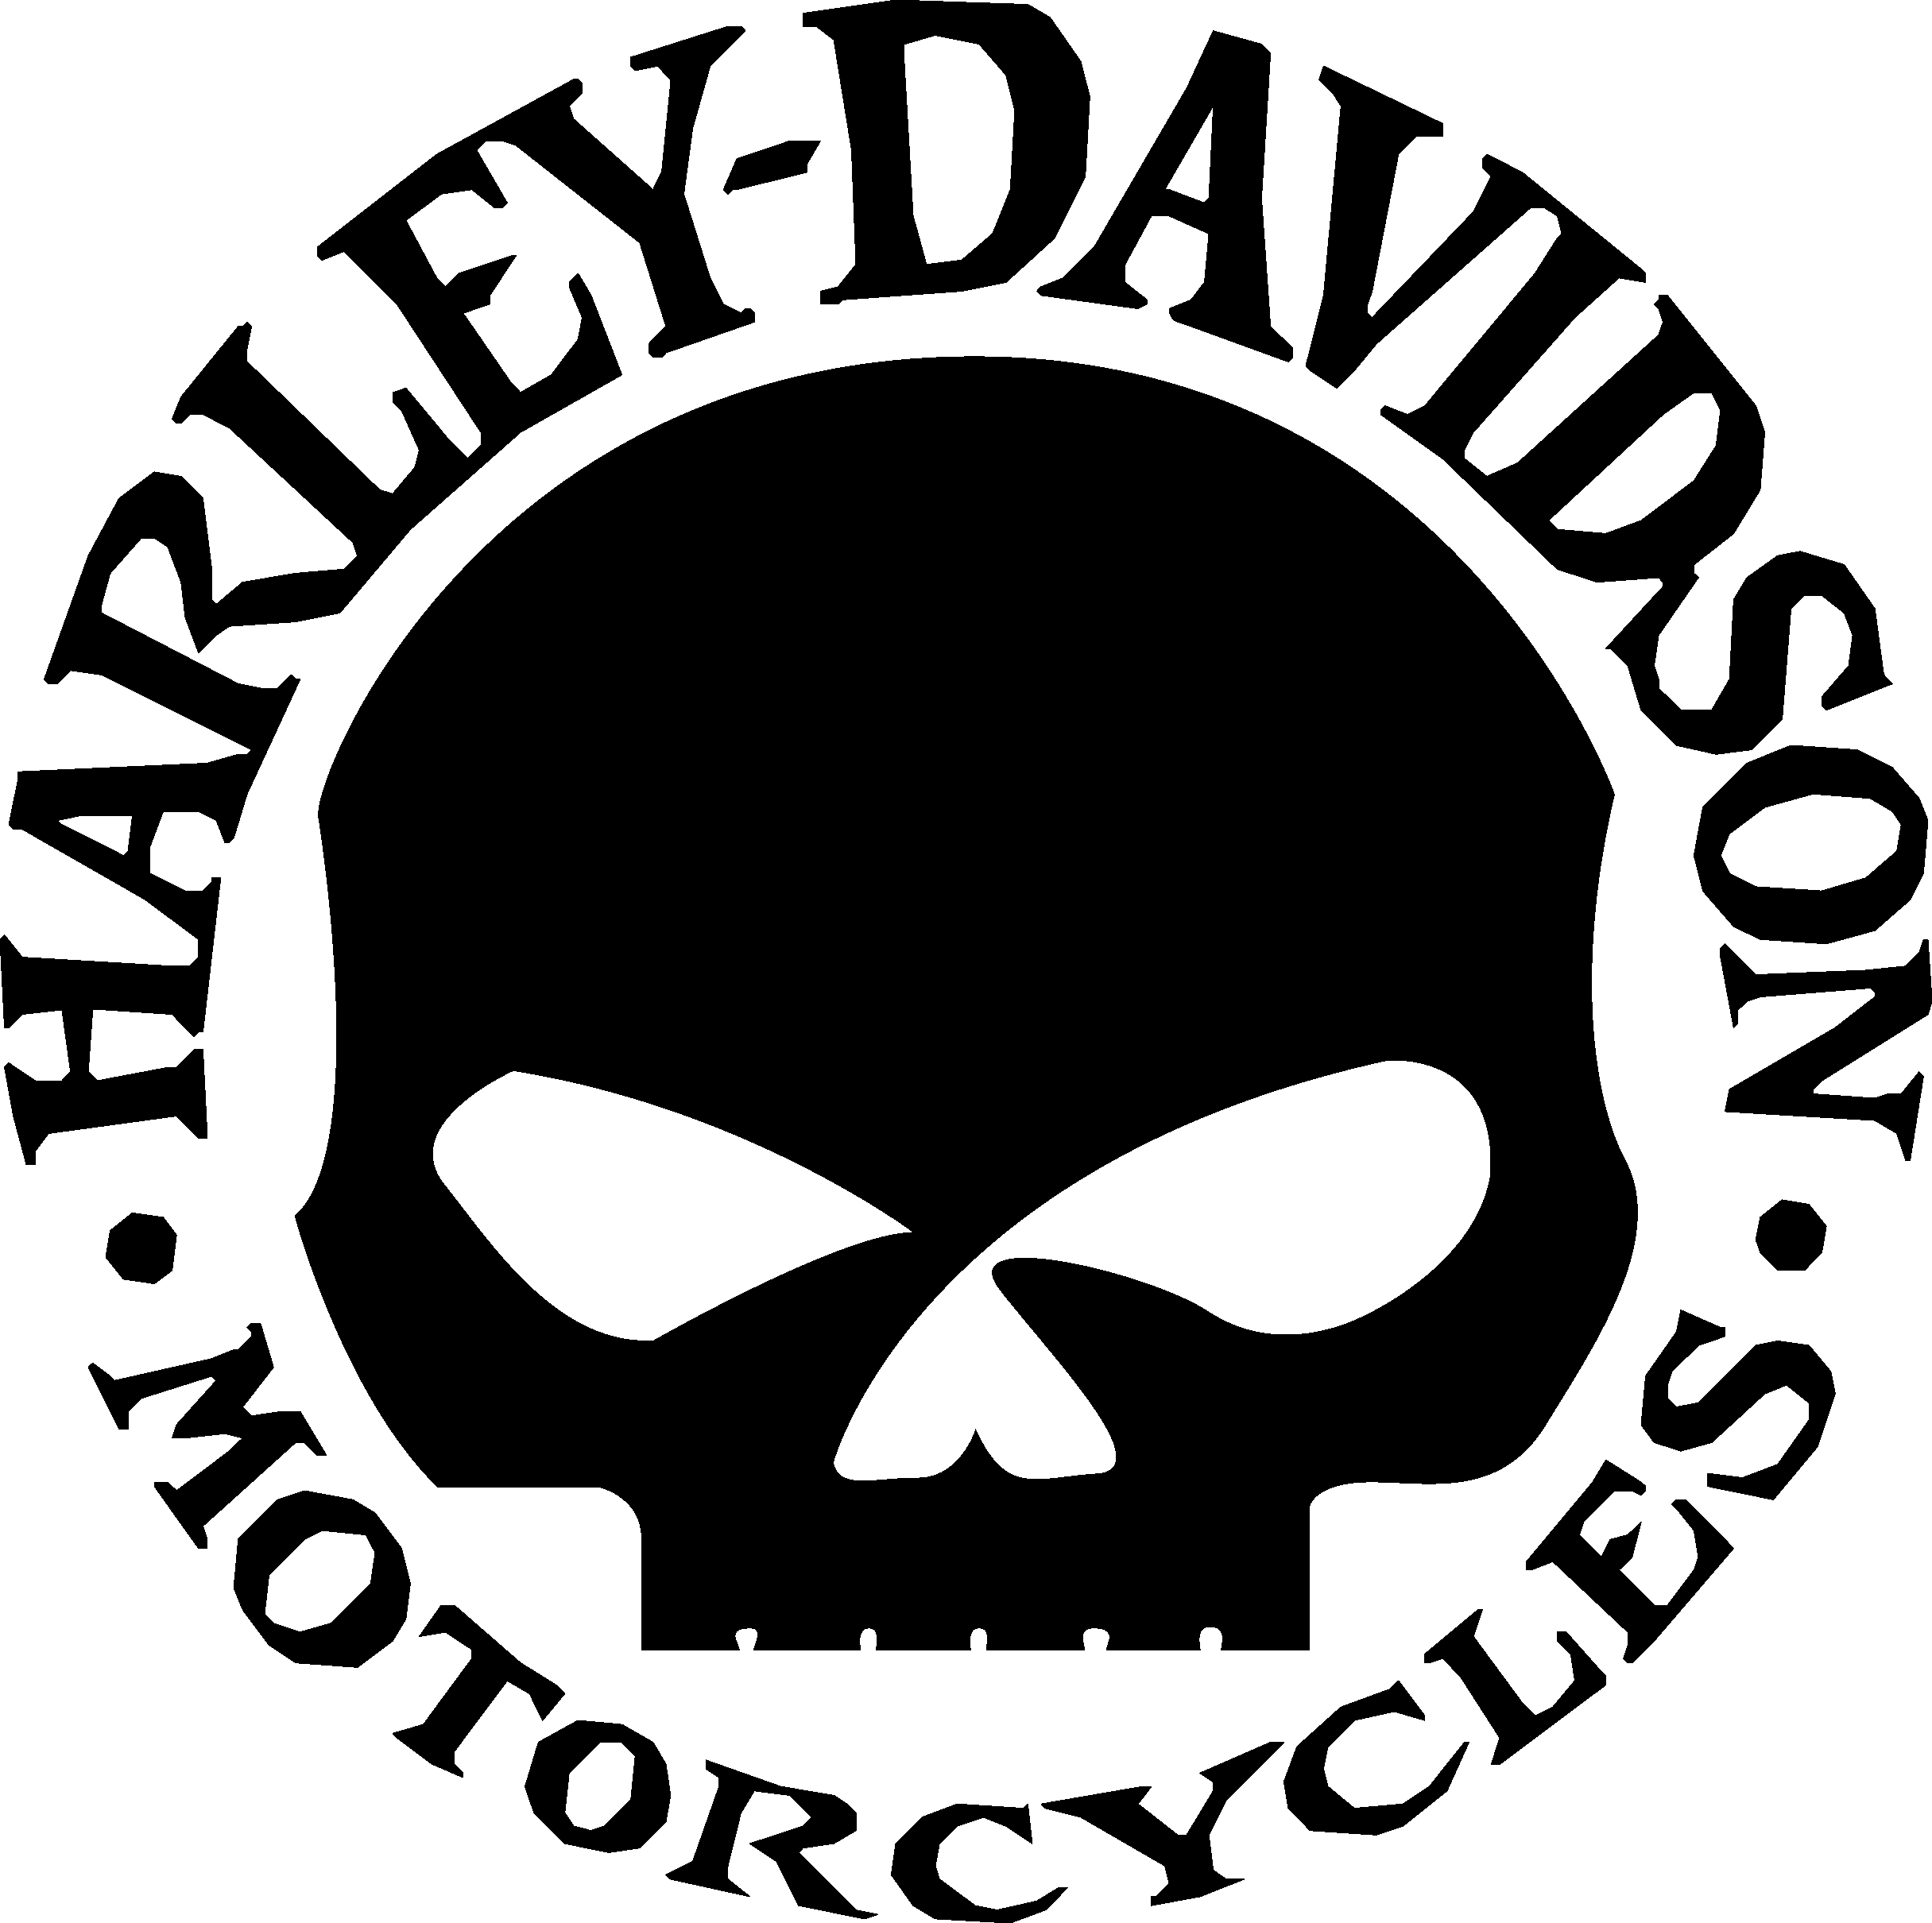 Willie G Skull Logo Harley Davidson Logo S Lijnpatronen